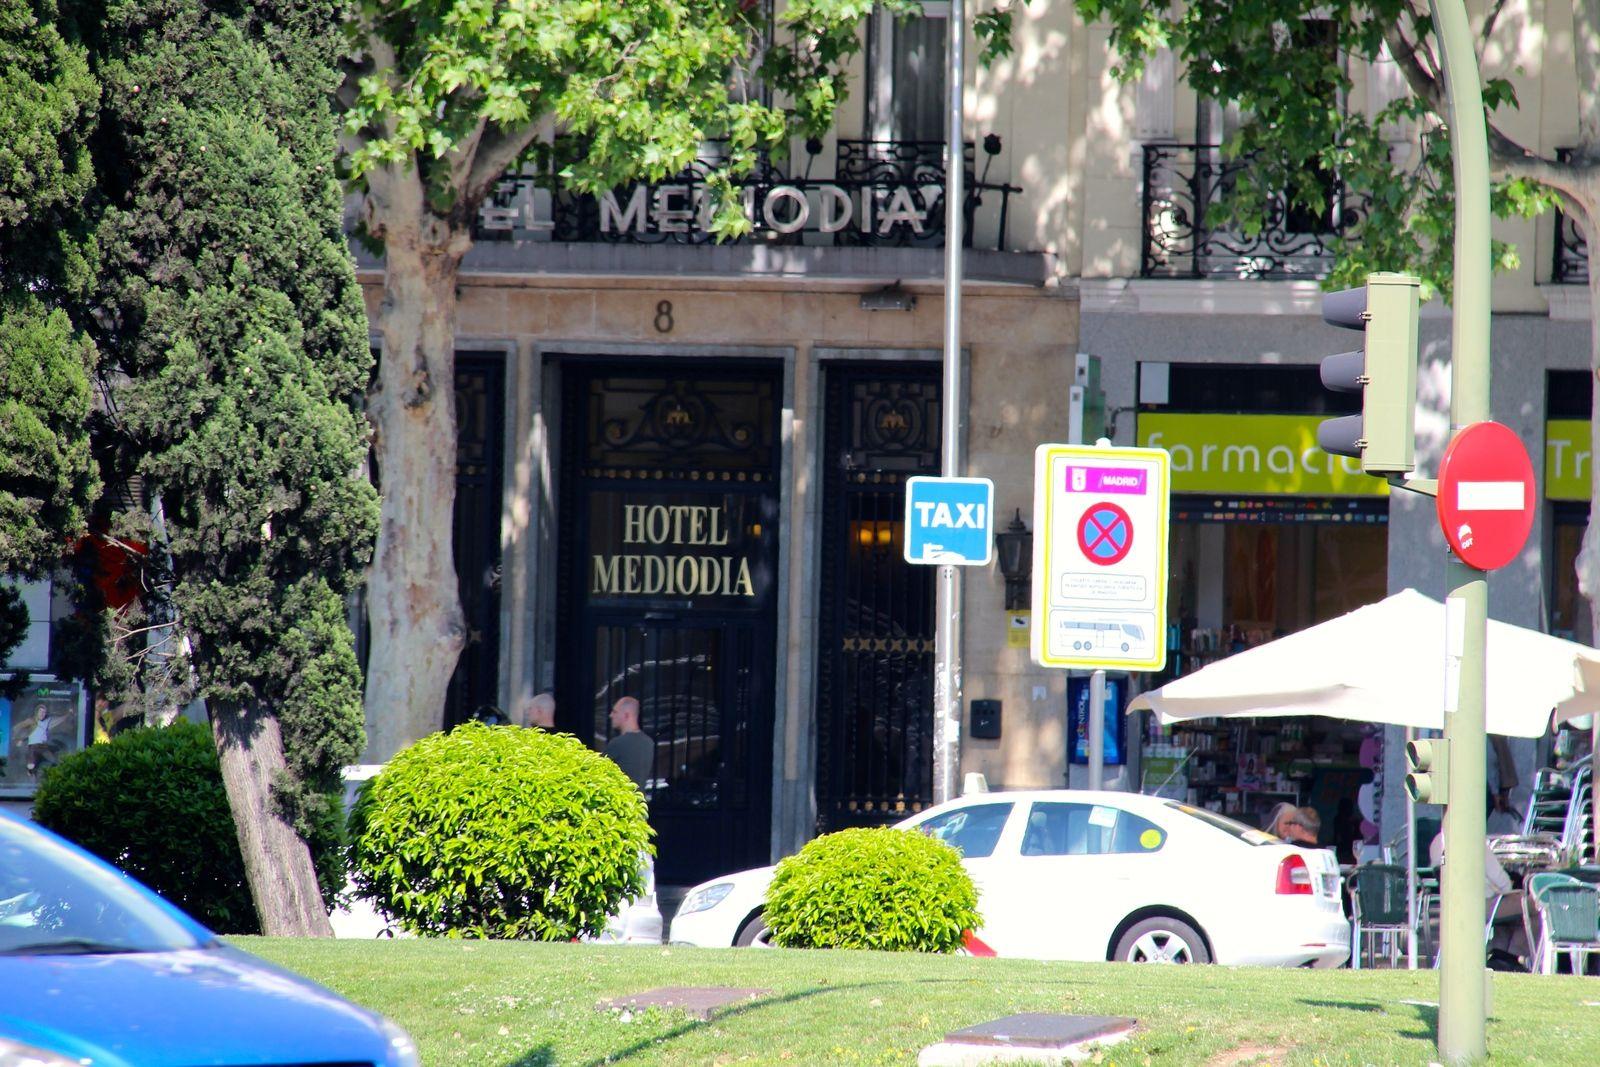 tennis-tourist-madrid-spain-hotel-mediodia-close-up-of-entrance-teri-church